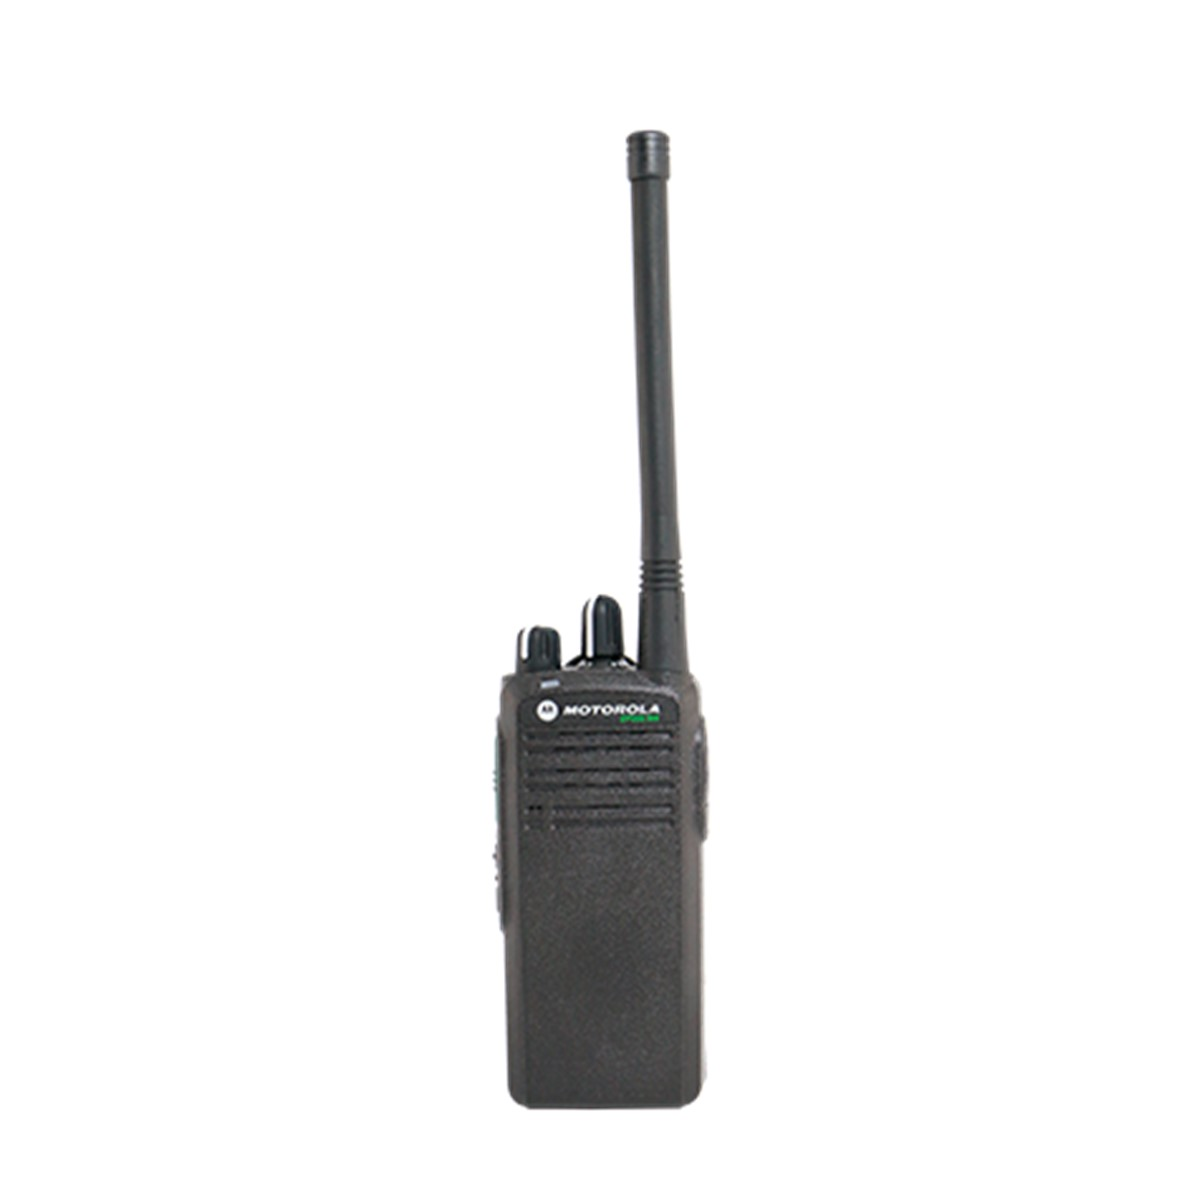 Radio Motorola EP350 MX Analógico LAH03KEC8AB7AN VHF 136-174 MHz sin pantalla y sin teclado